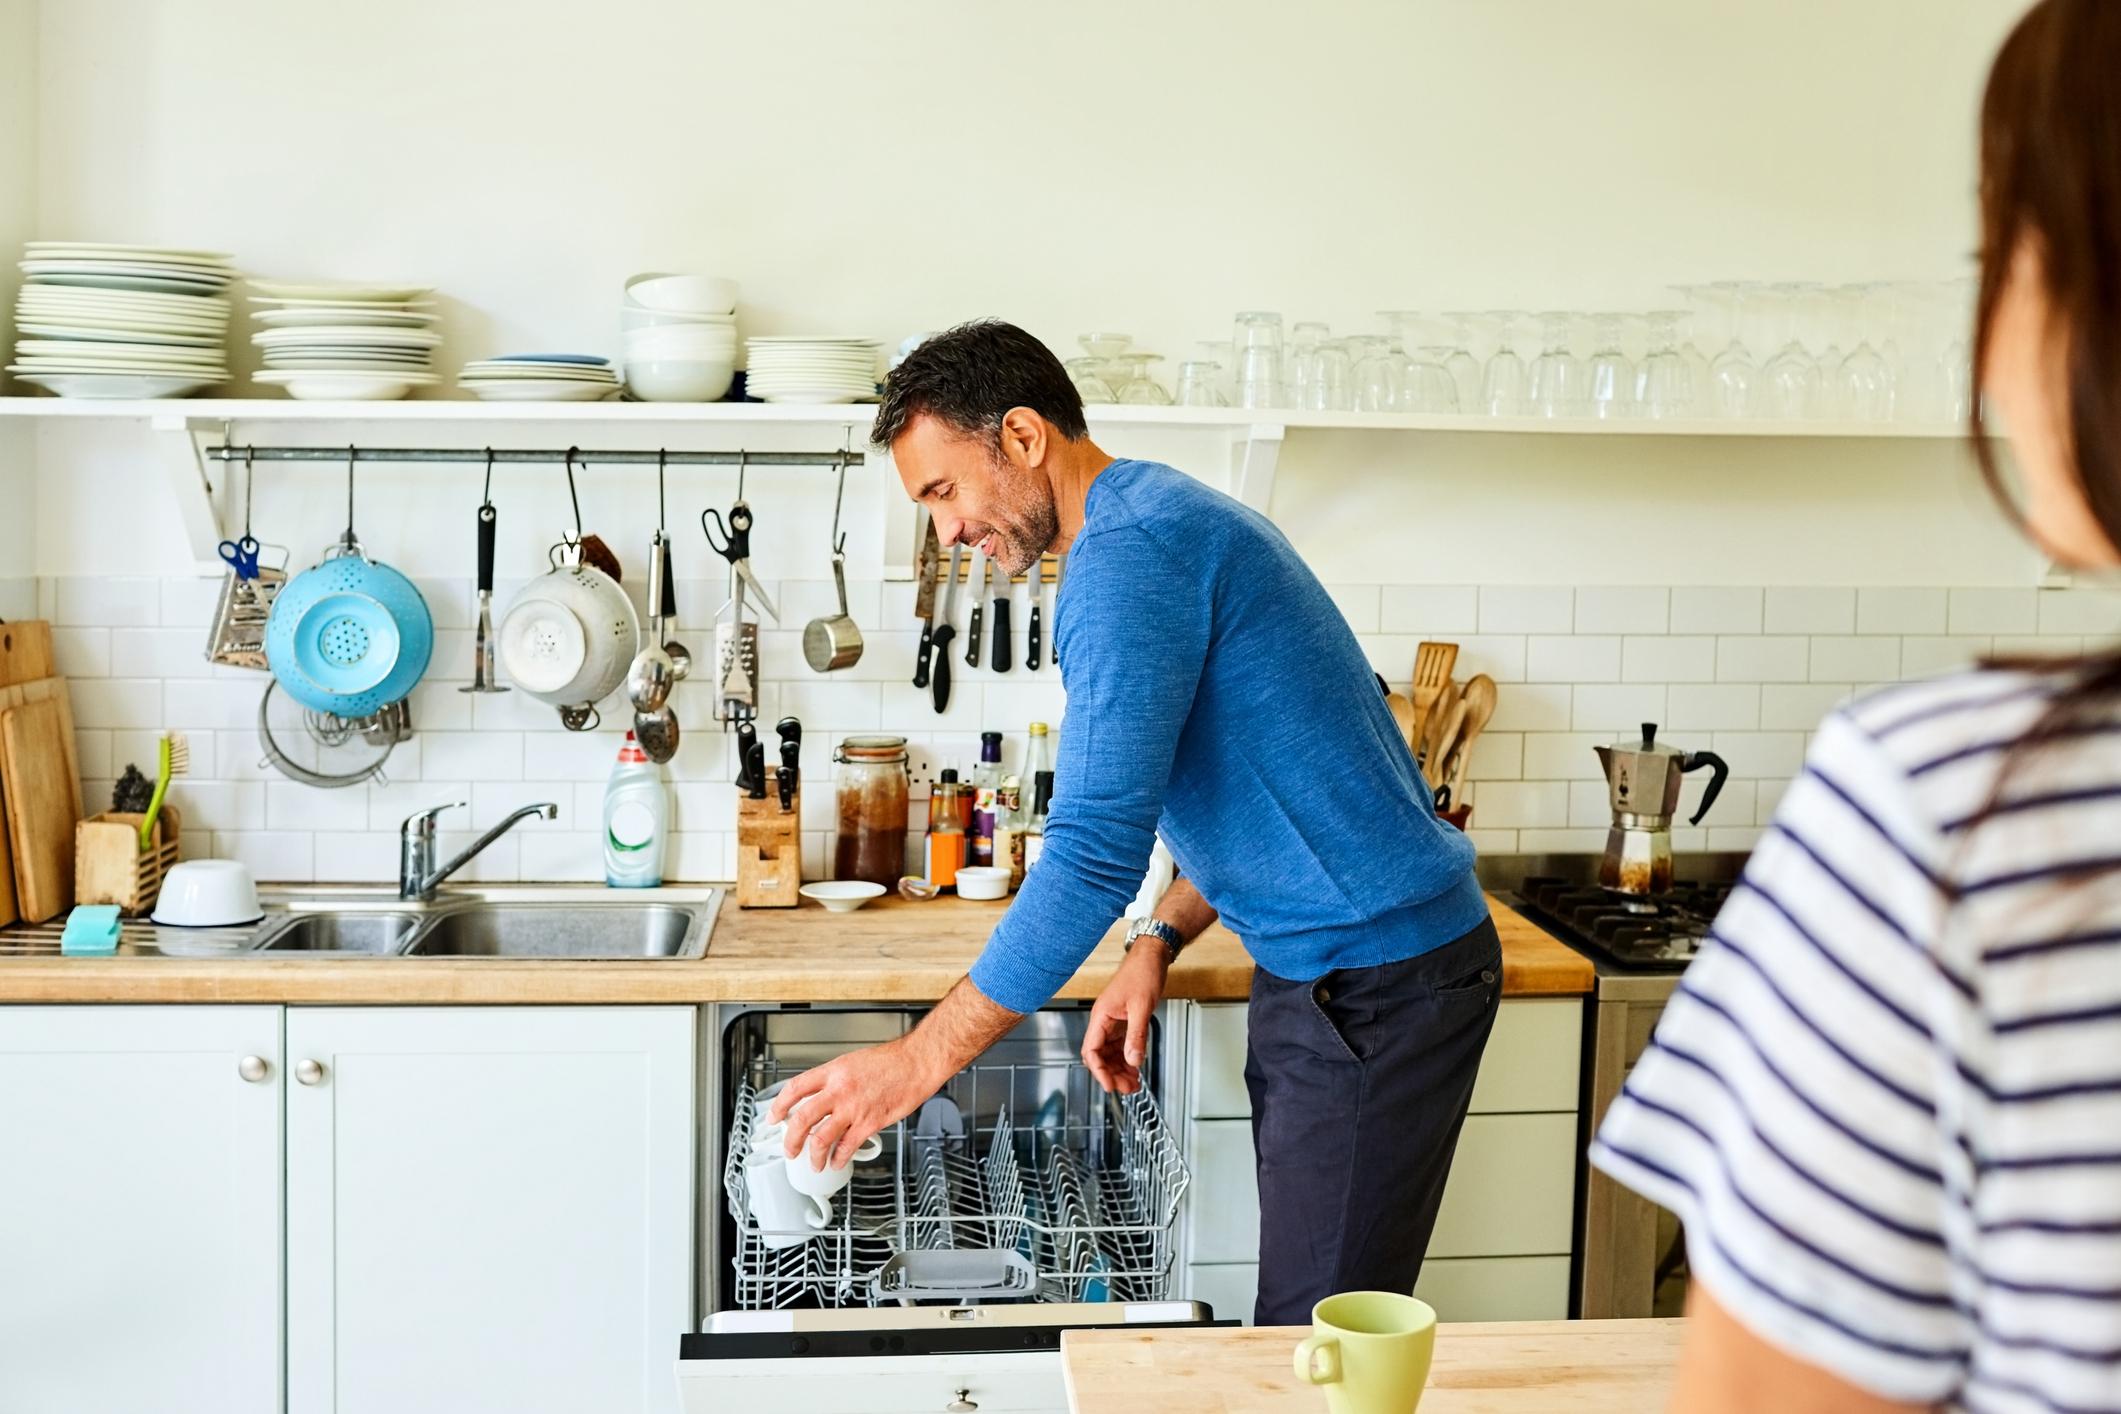 man loading coffee mugs into the dishwasher